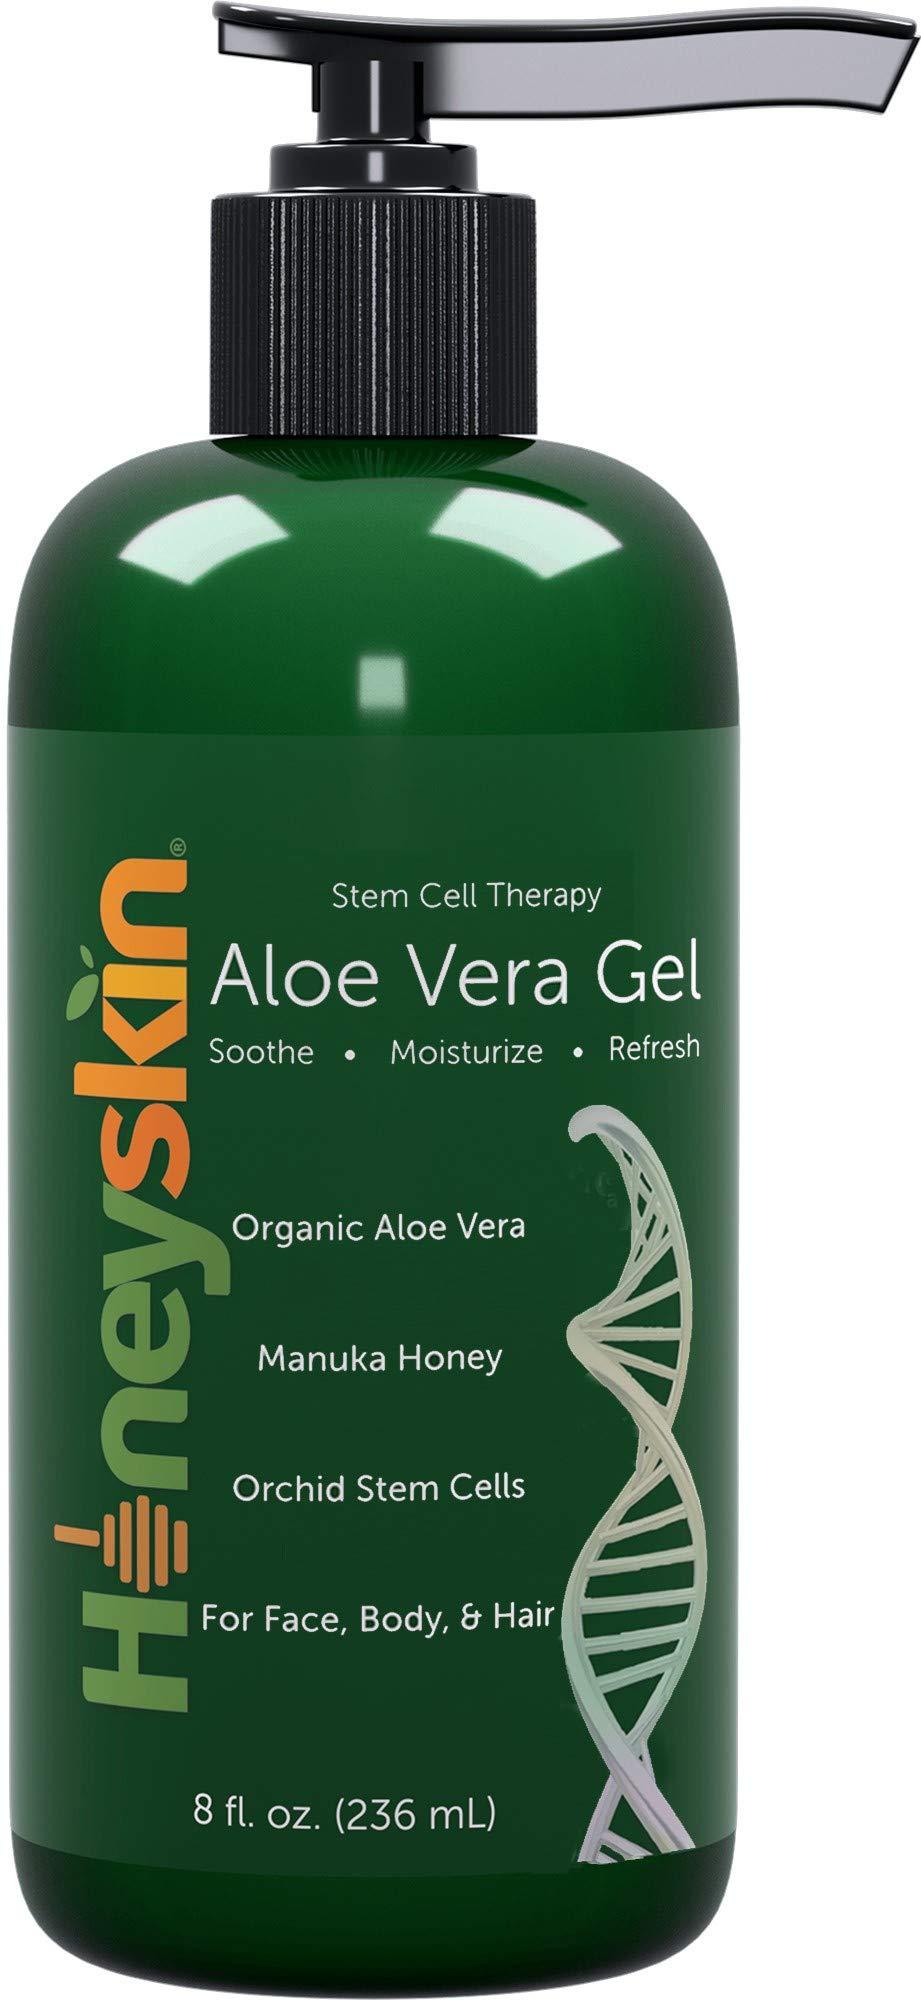 Organic Aloe Vera Leaf Gel - Face and Body Moisturizer for Sensitive Skin with Manuka Honey, Apple & Orchid Stem Cells - Hydrating Gel for Sunburn, Acne, Eczema, Psoriasis, Dry Skin & Scalp (8 oz) by Honeyskin Organics